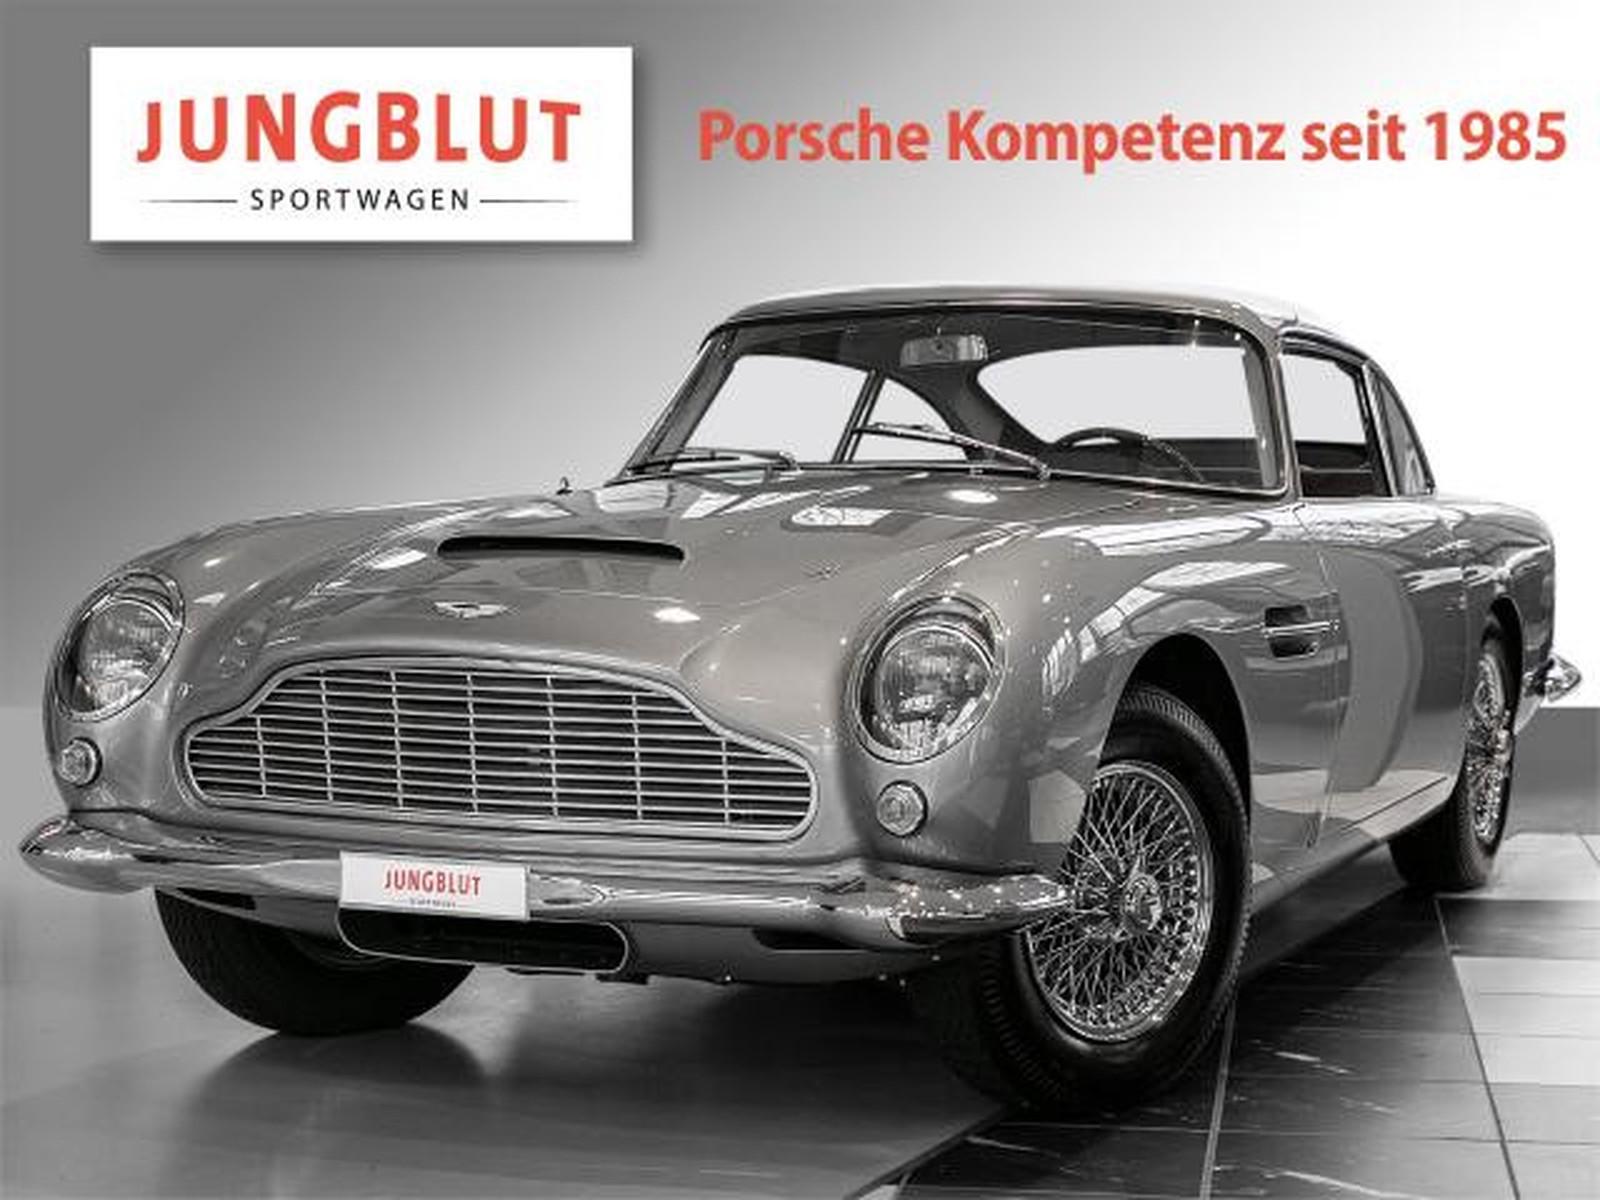 Aston Martin Db5 Oldtimer Buy In Hamburg Int Nr 433 Sold